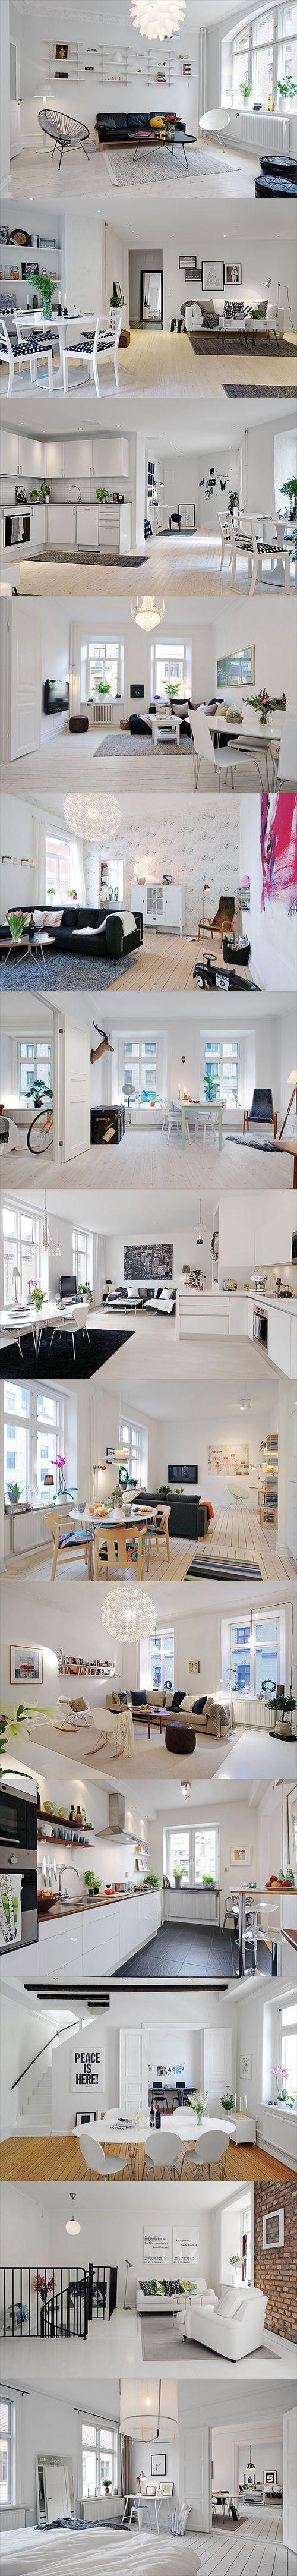 Beautiful & Stylish Scandinavian interior design inspiration 01